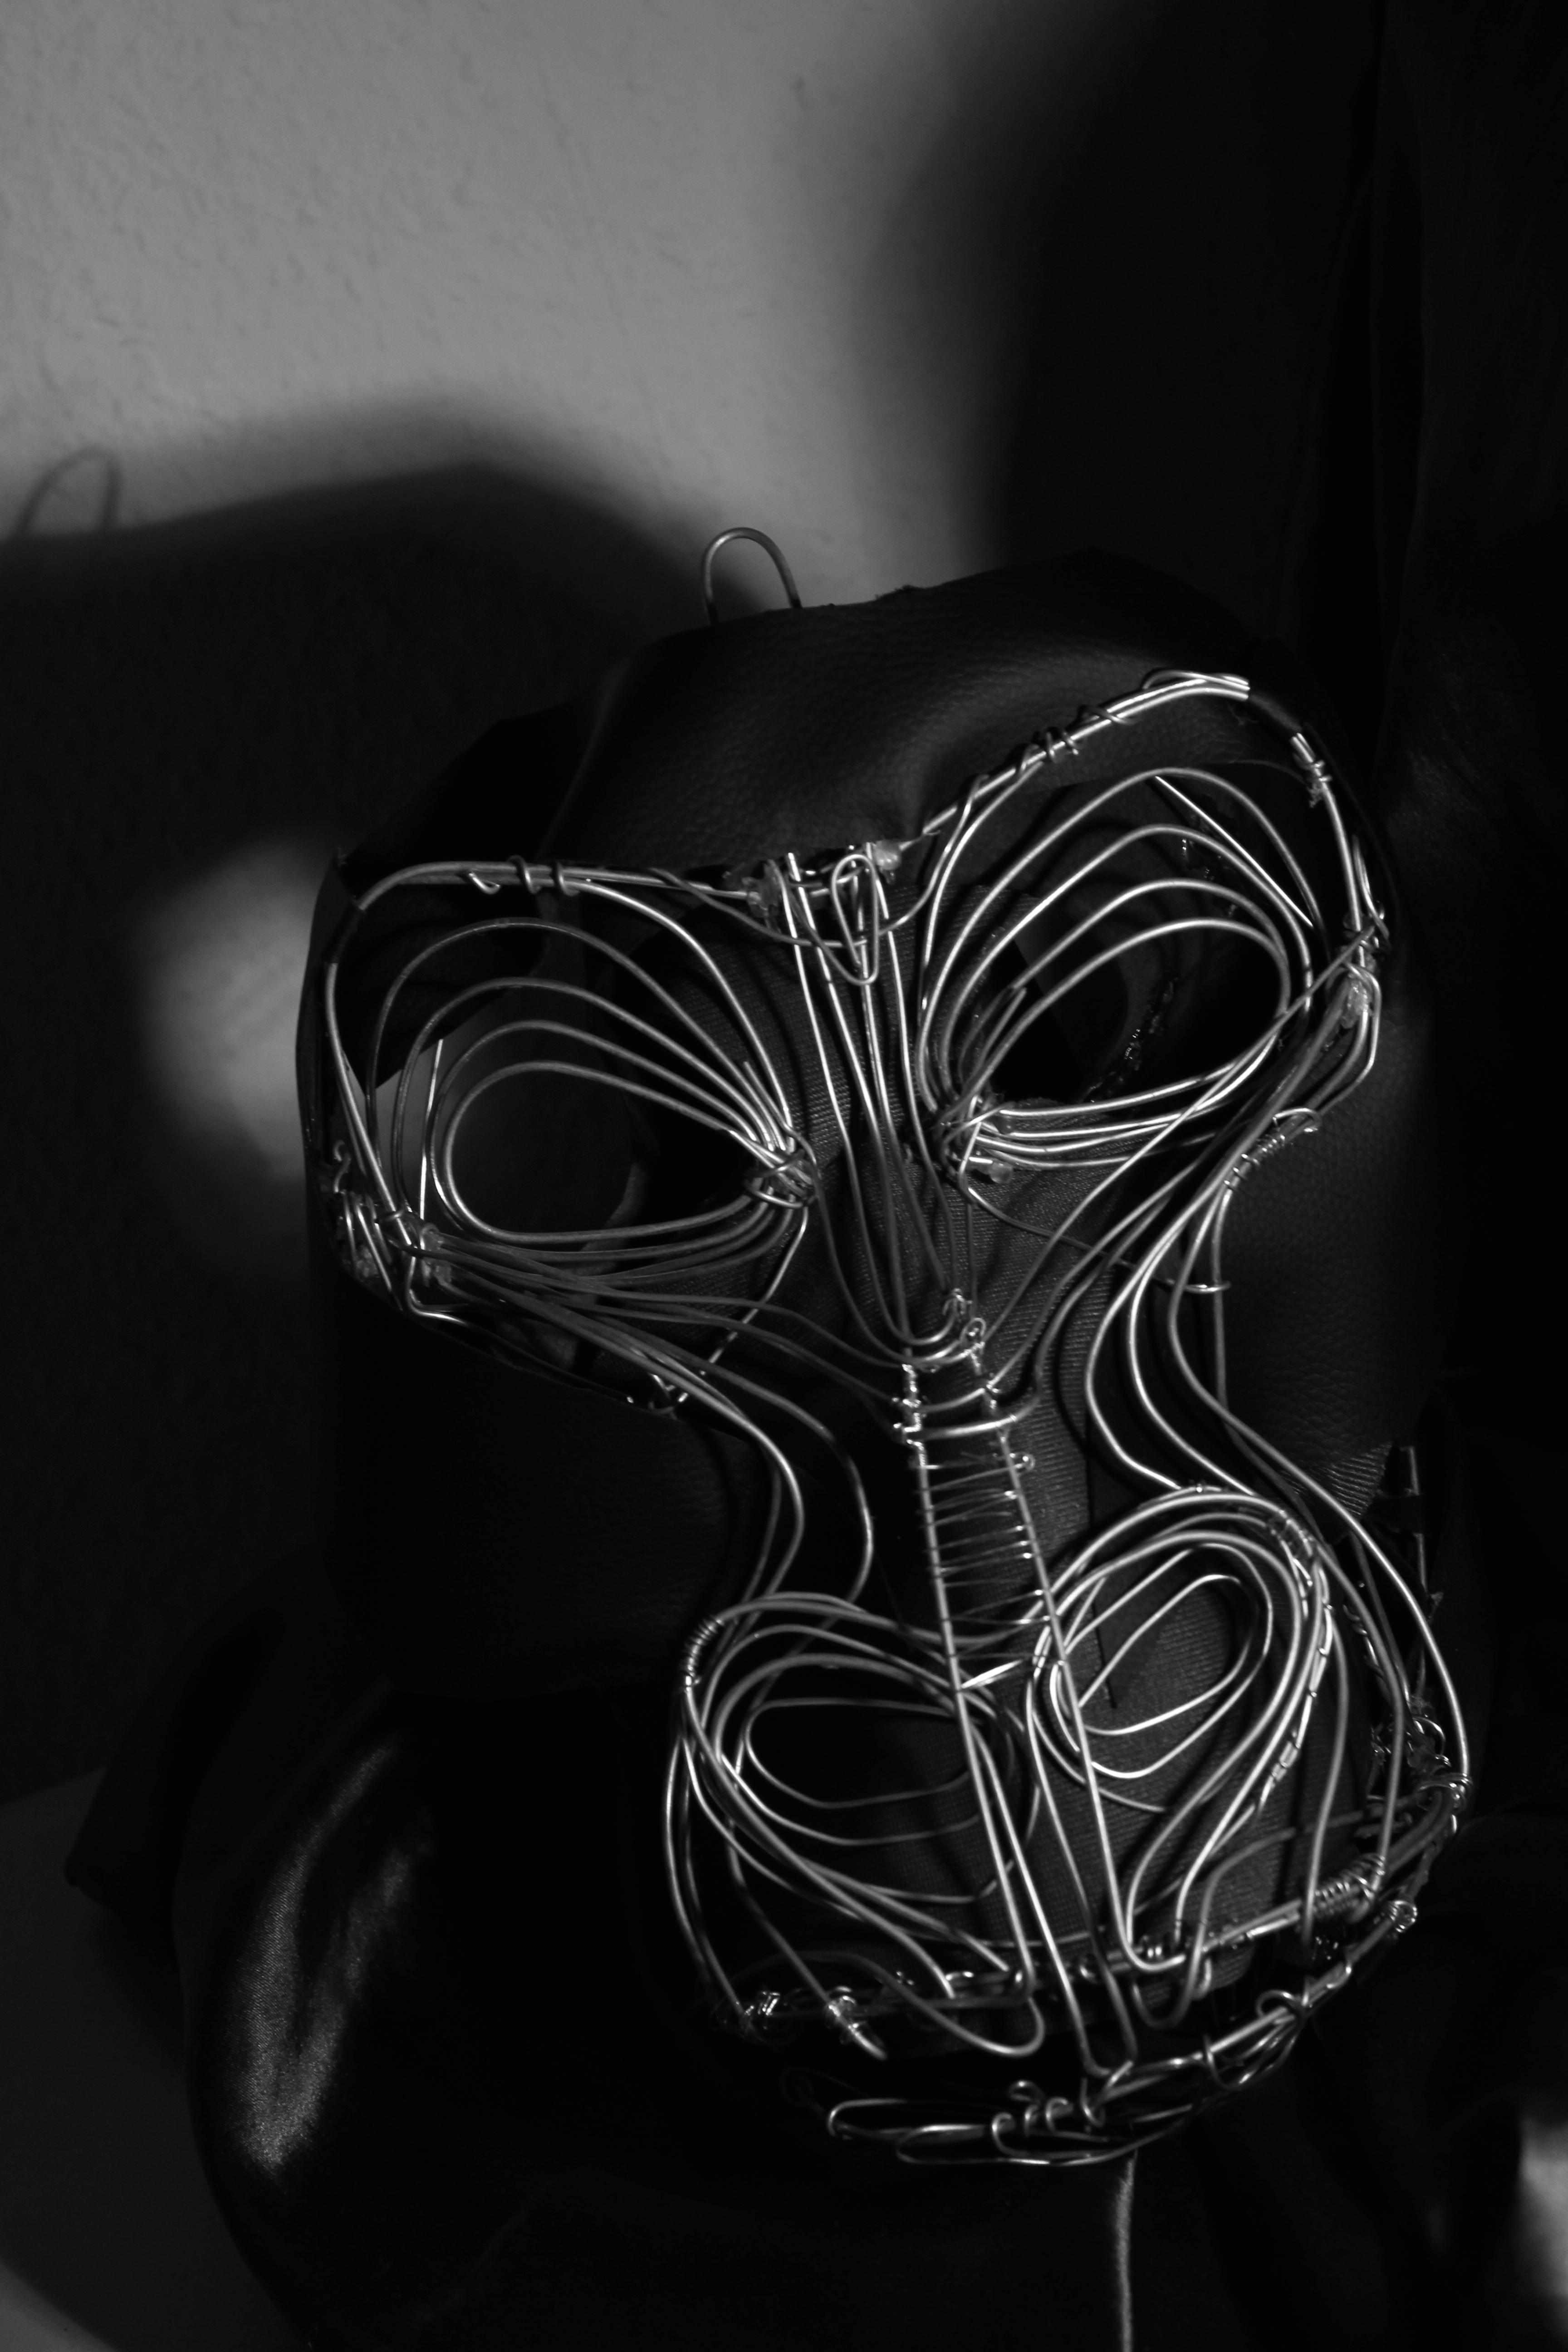 Liz Kosack - Gorilla mask #1